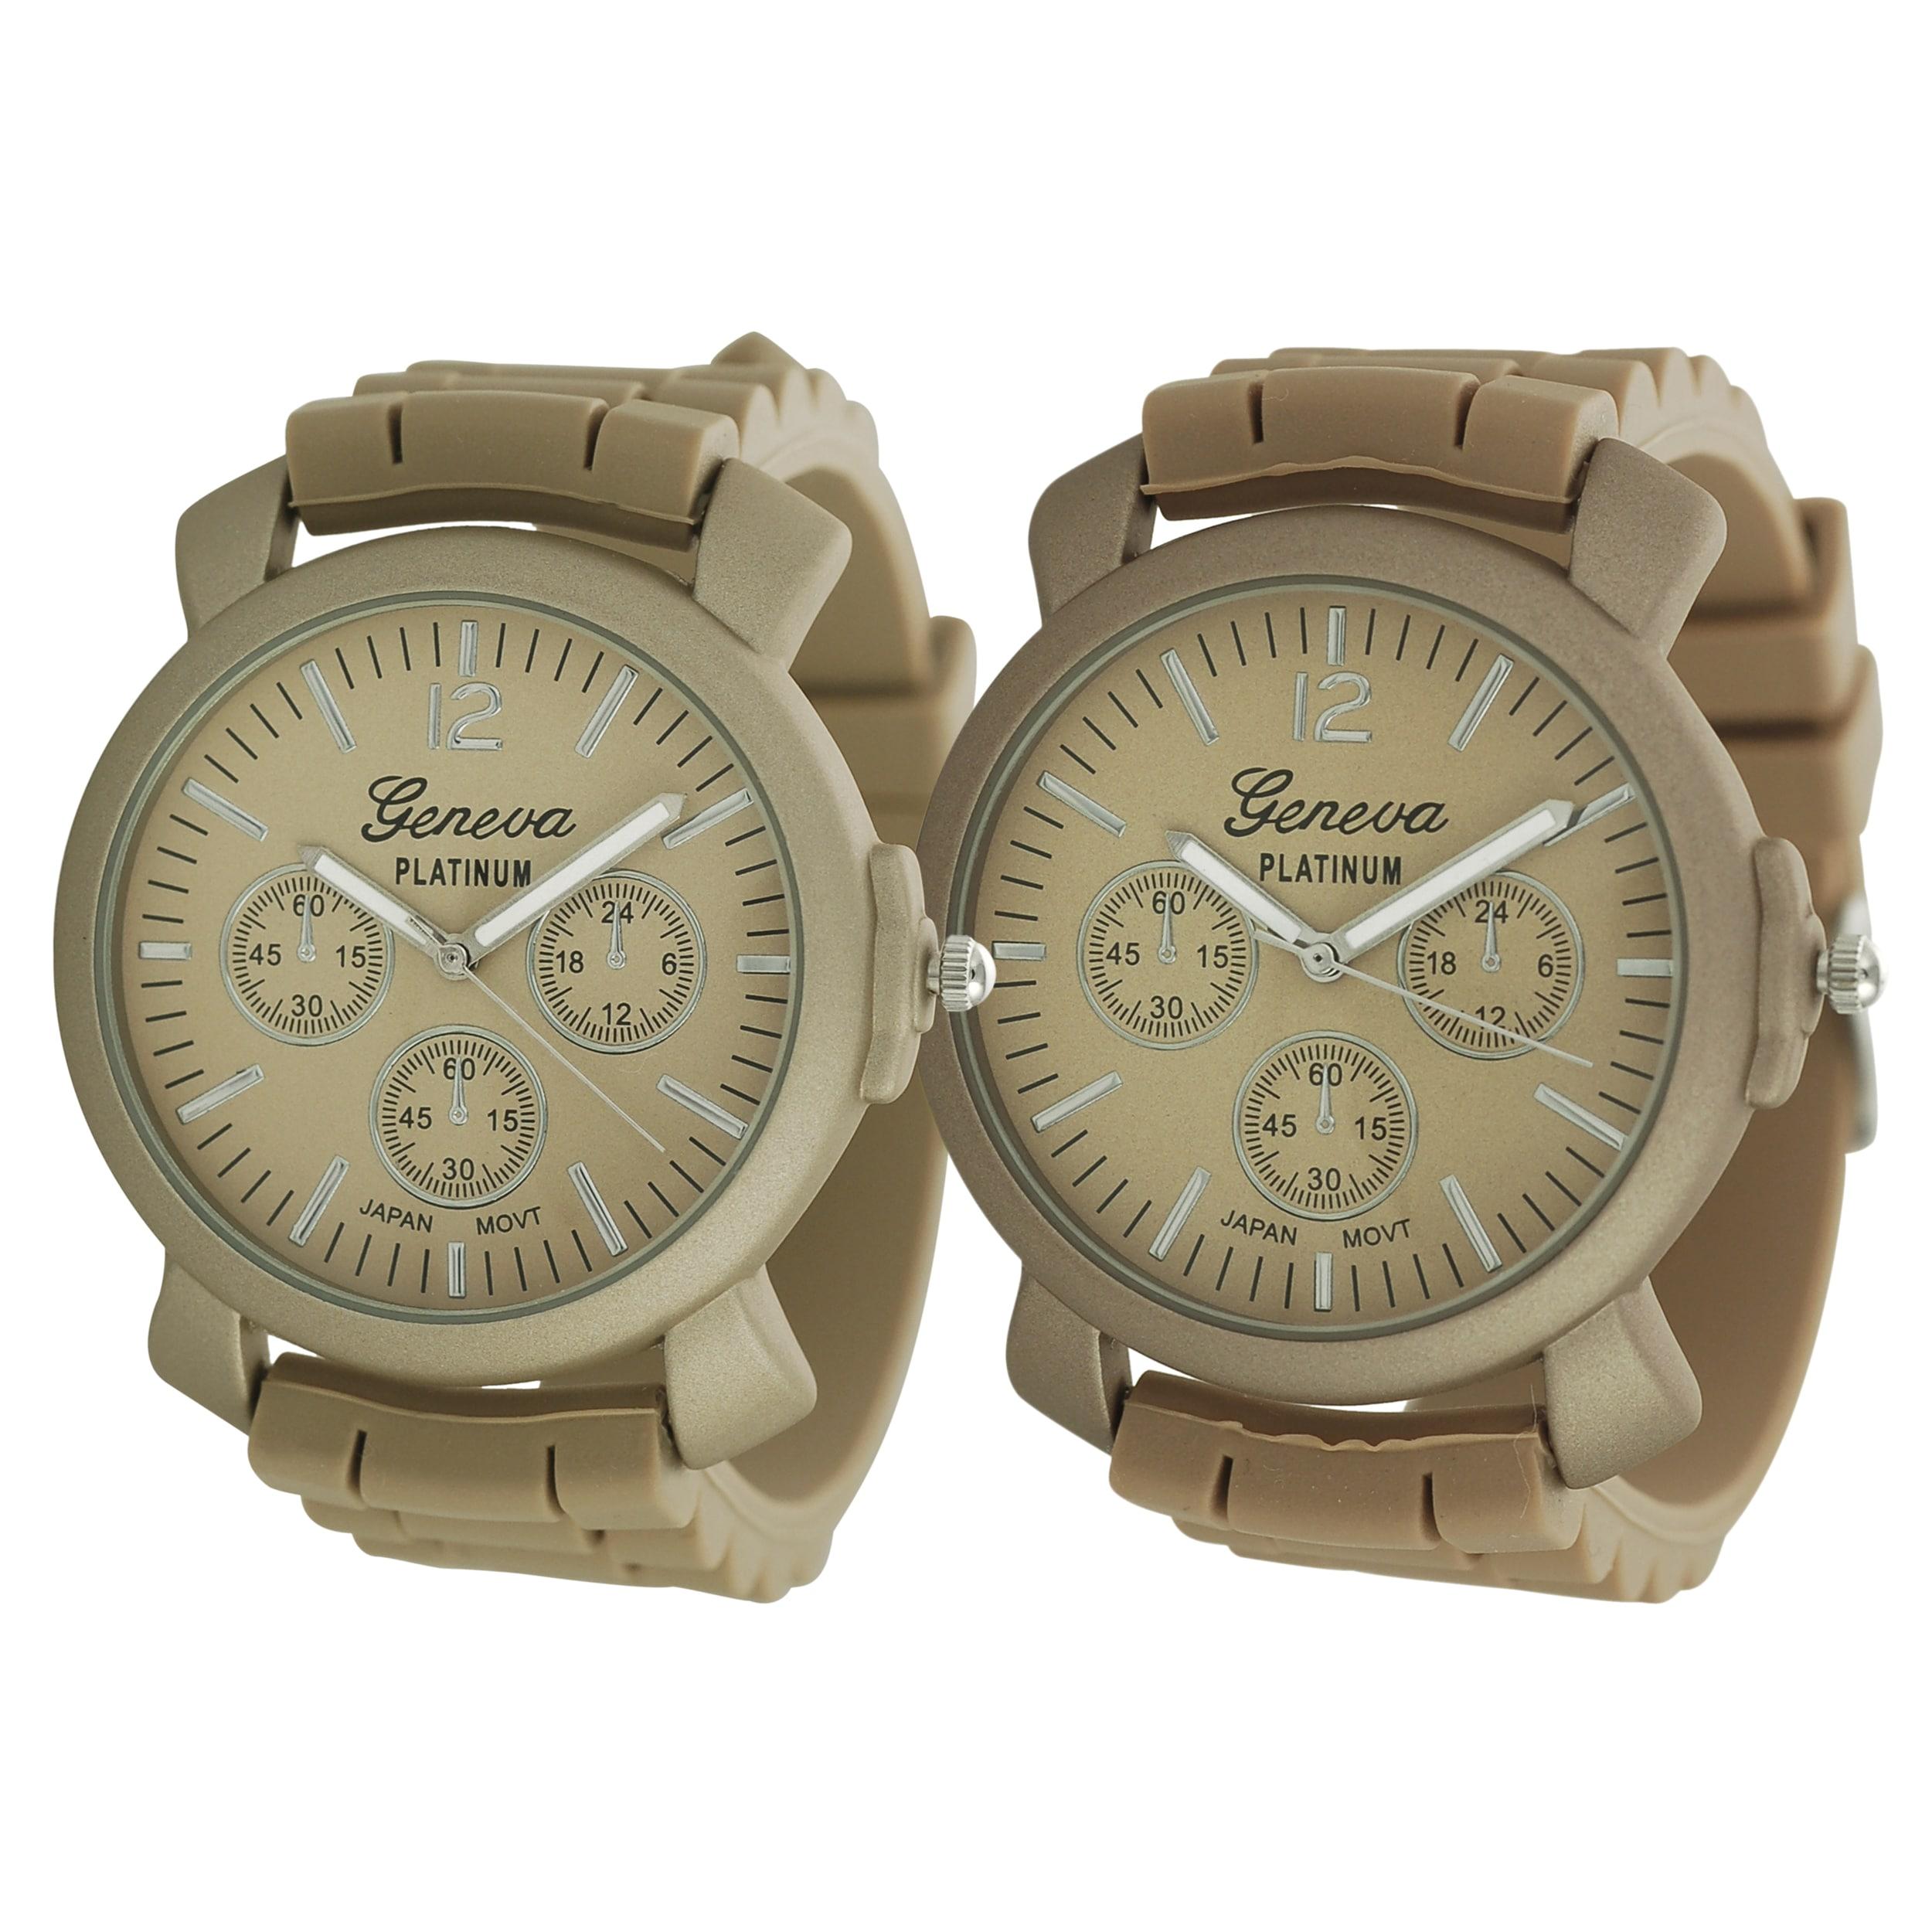 Geneva Platinum Men's Chronograph-Style Dusty Rose Silicone Watch